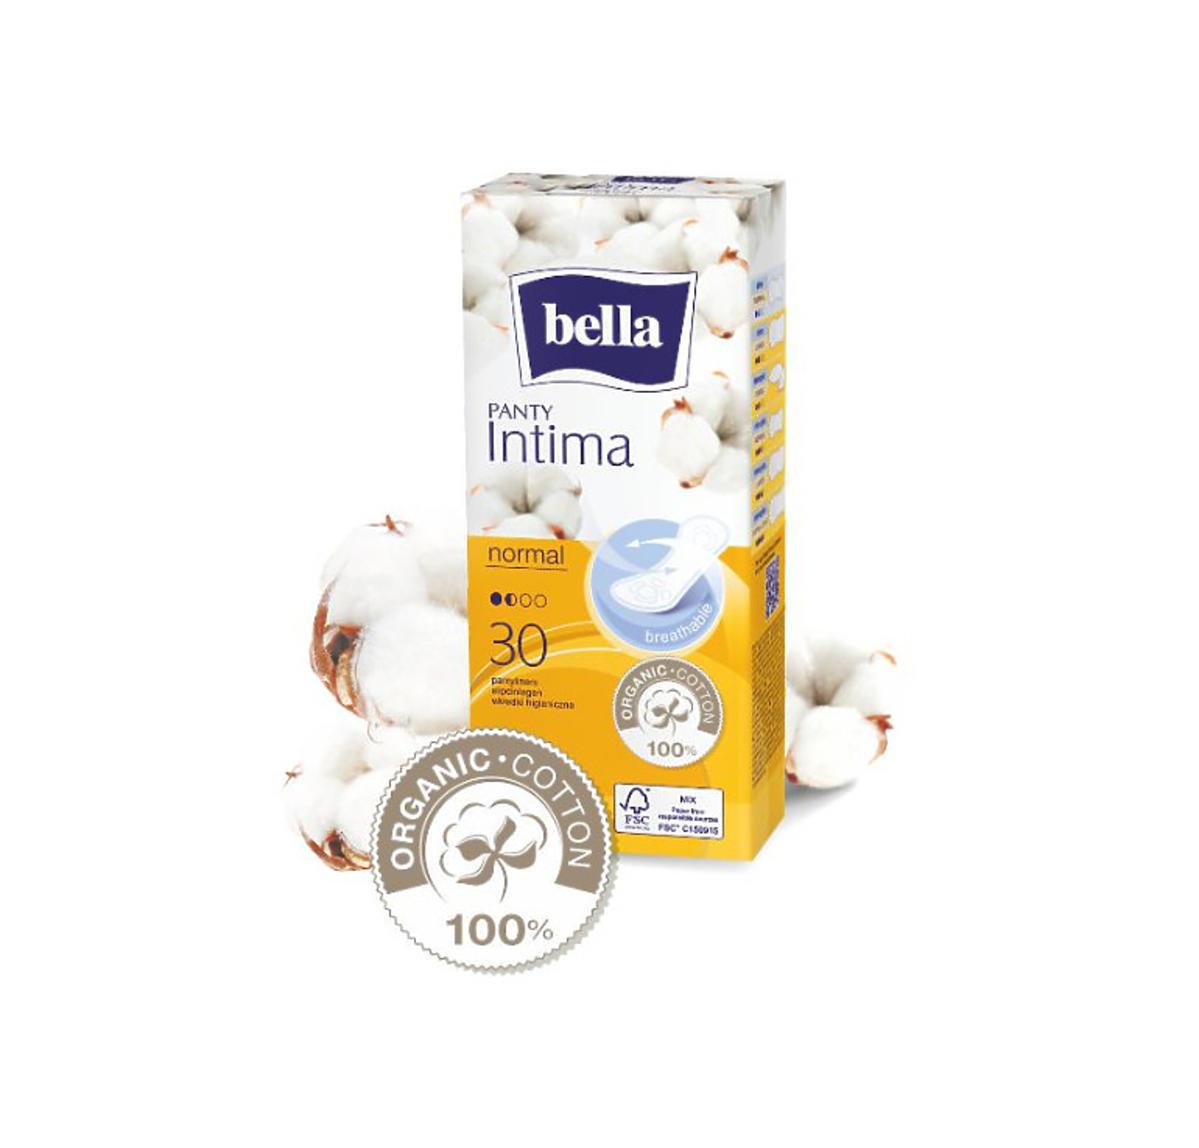 bella-panty-intima